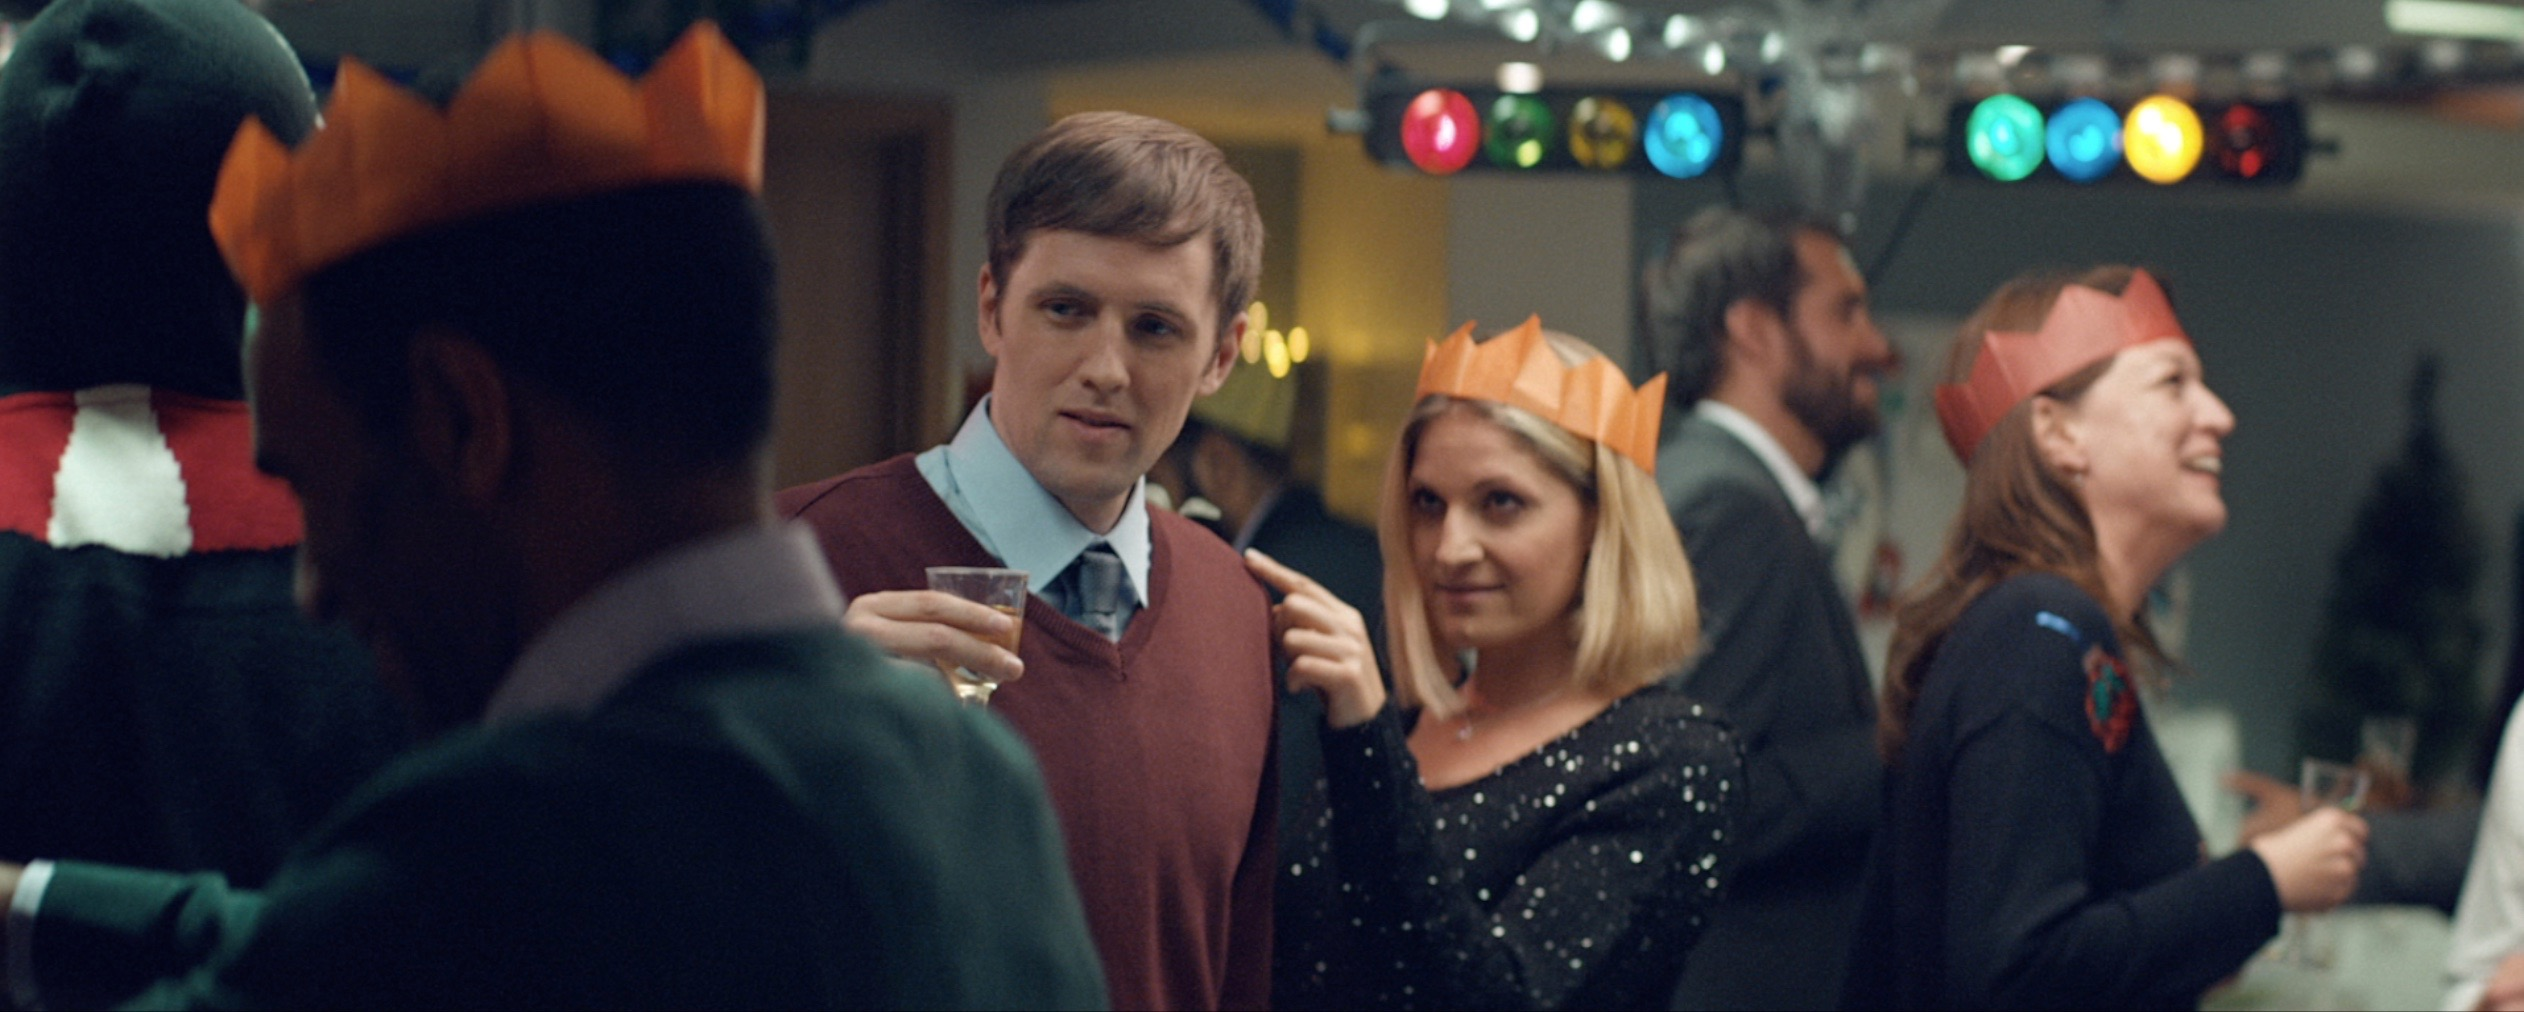 Adam Bellamy in Asda (commercial)